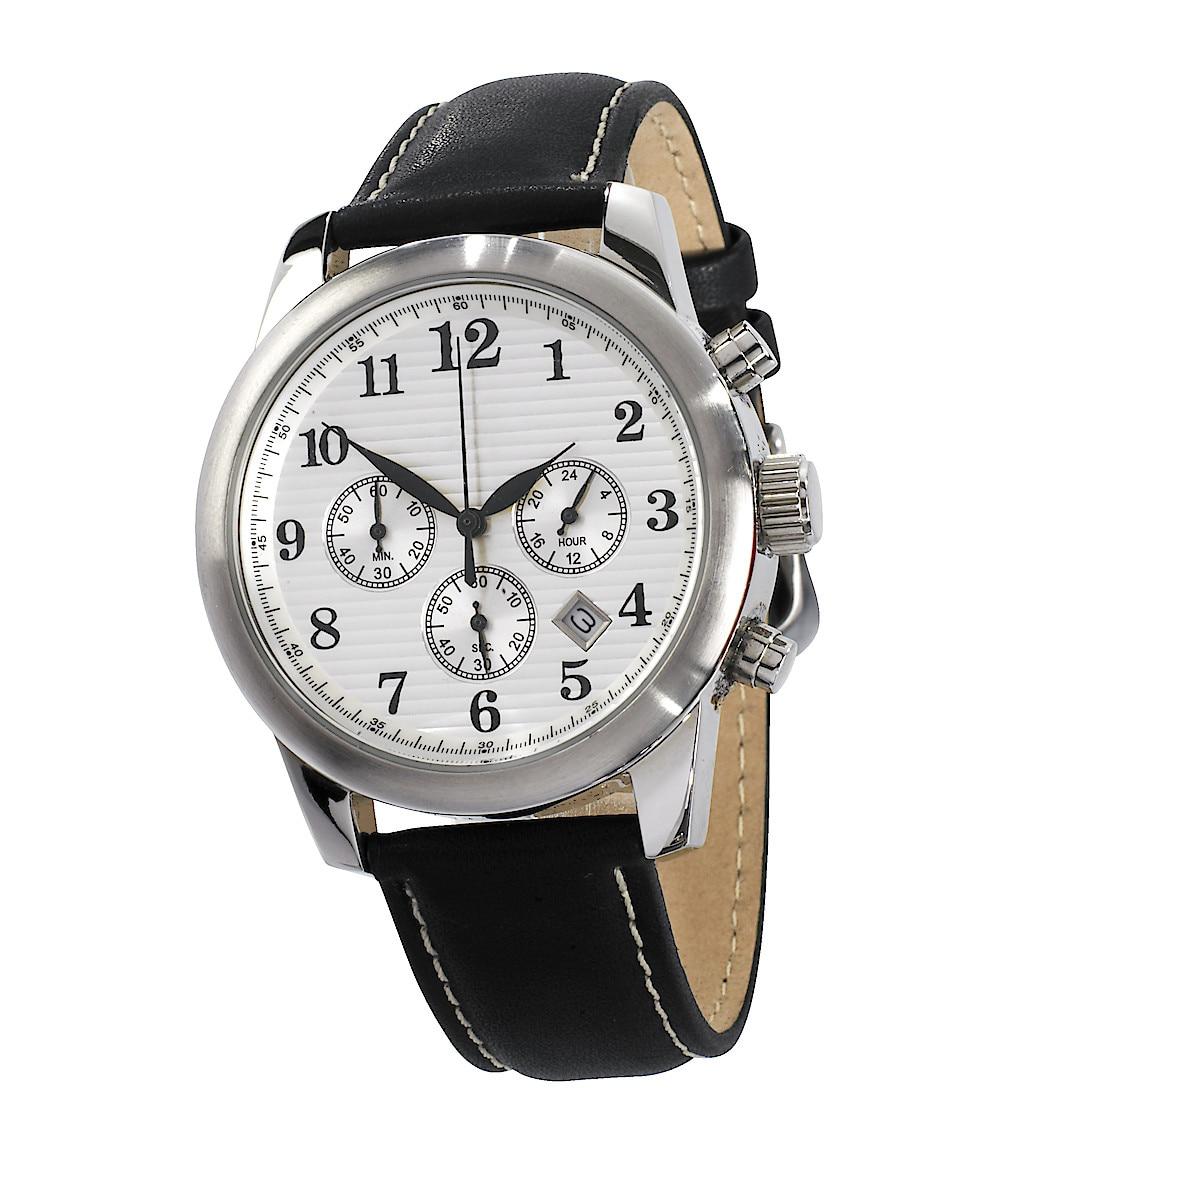 Armbåndsur, kronograf